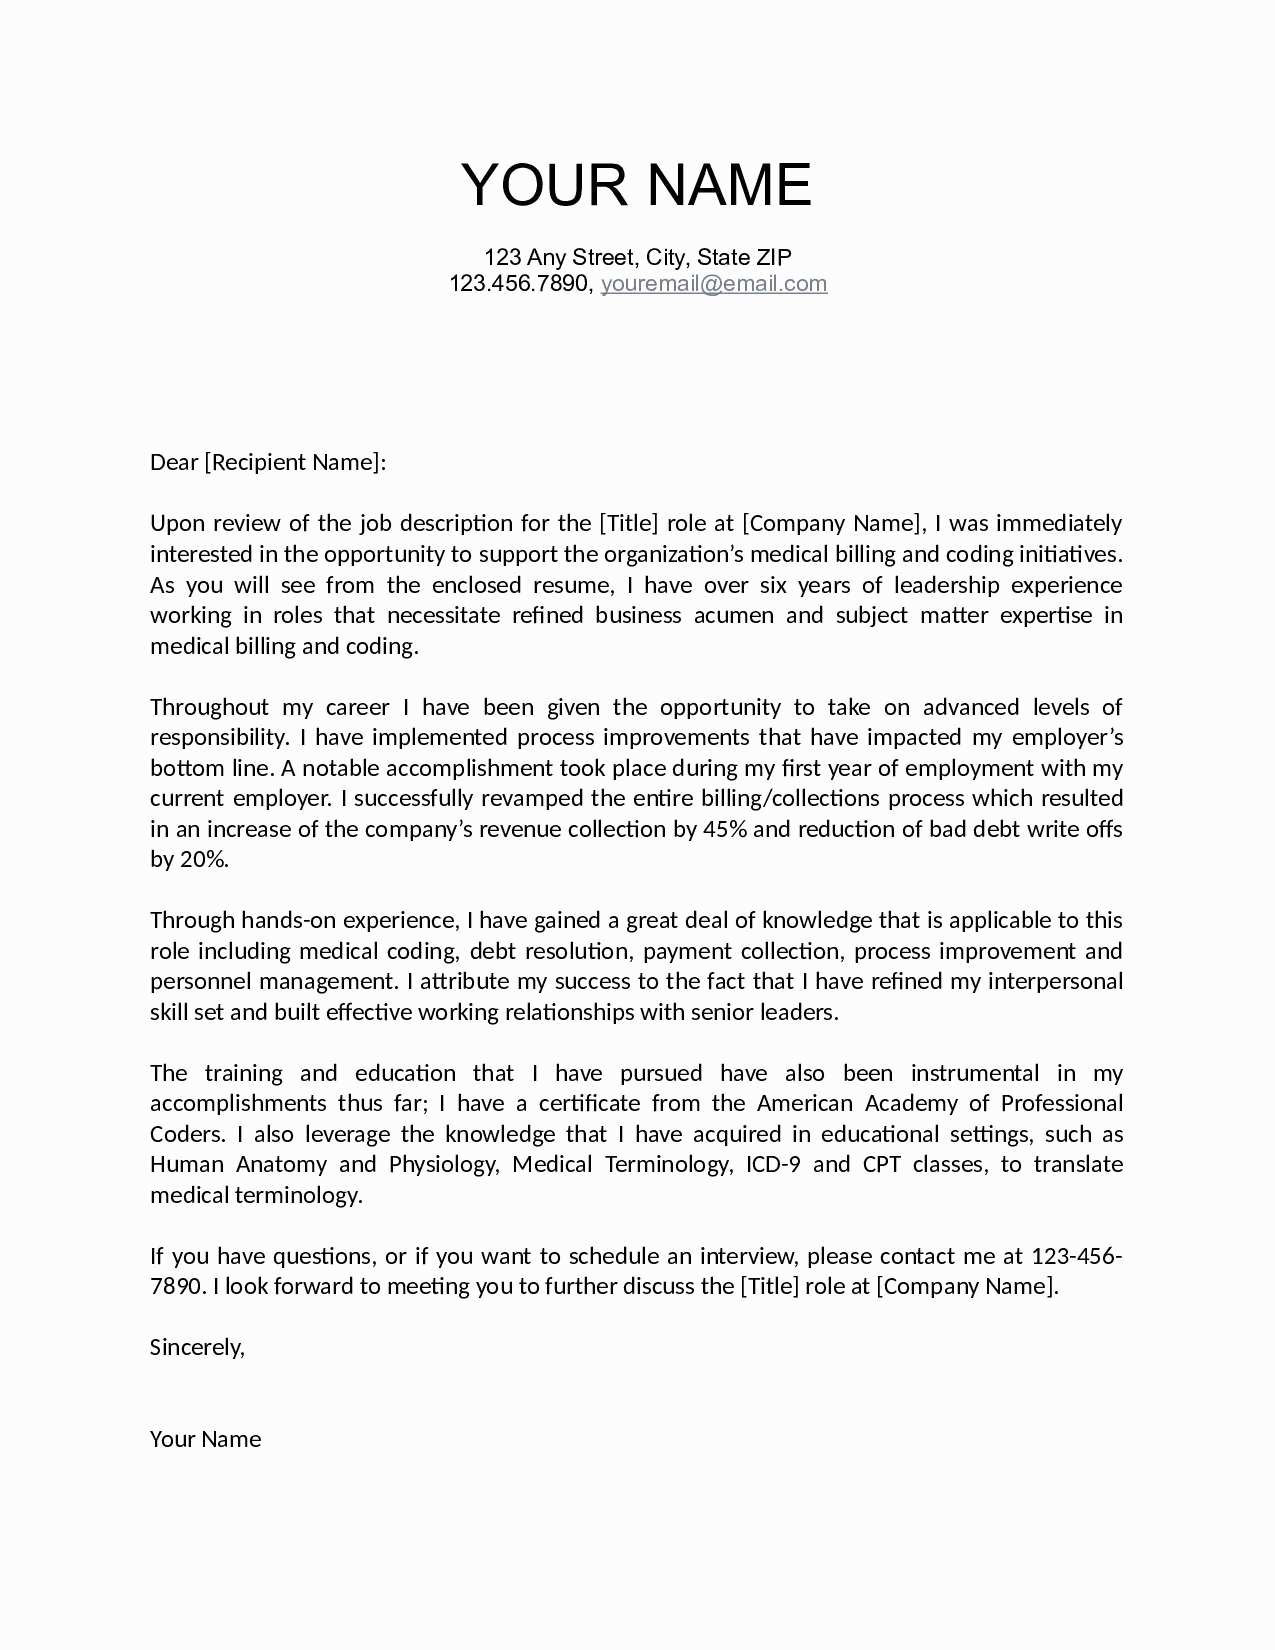 Consultation Letter Template - Management Consulting Cover Letter Lovely Job Fer Letter Template Us